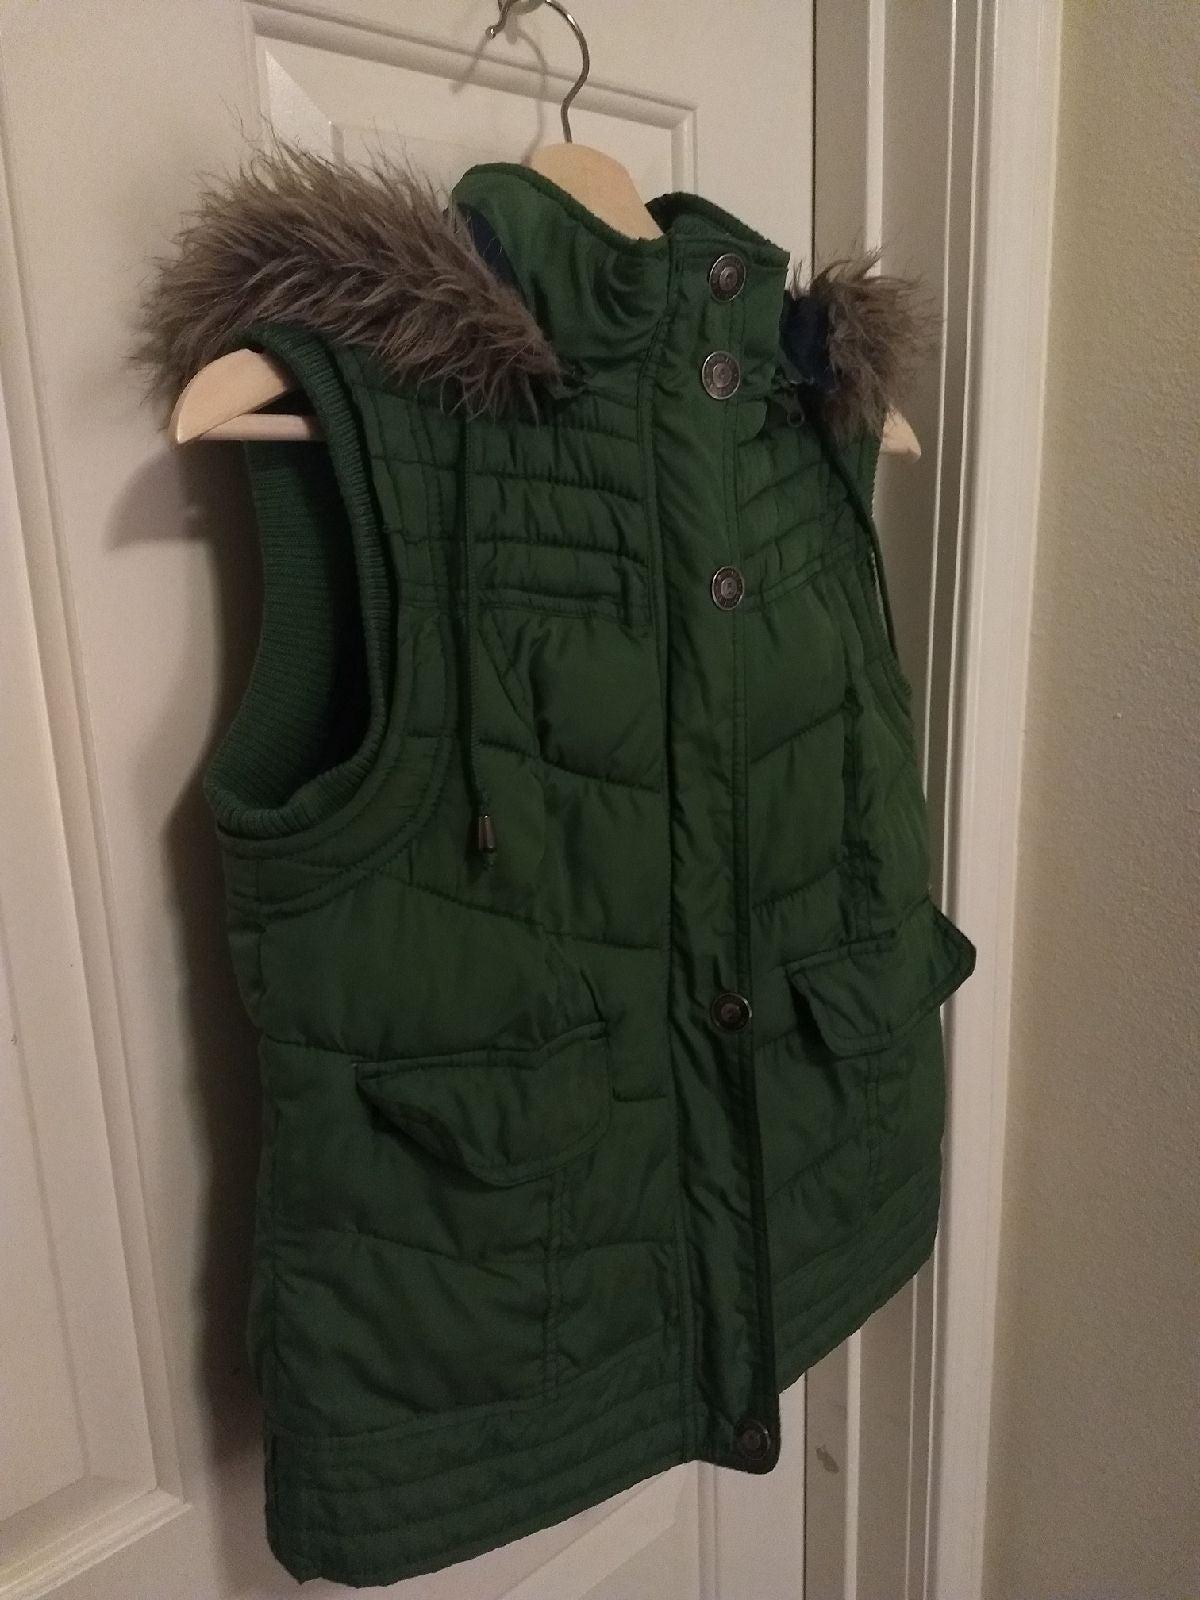 Puffy Vest, Faux fur Hood, emerald Green